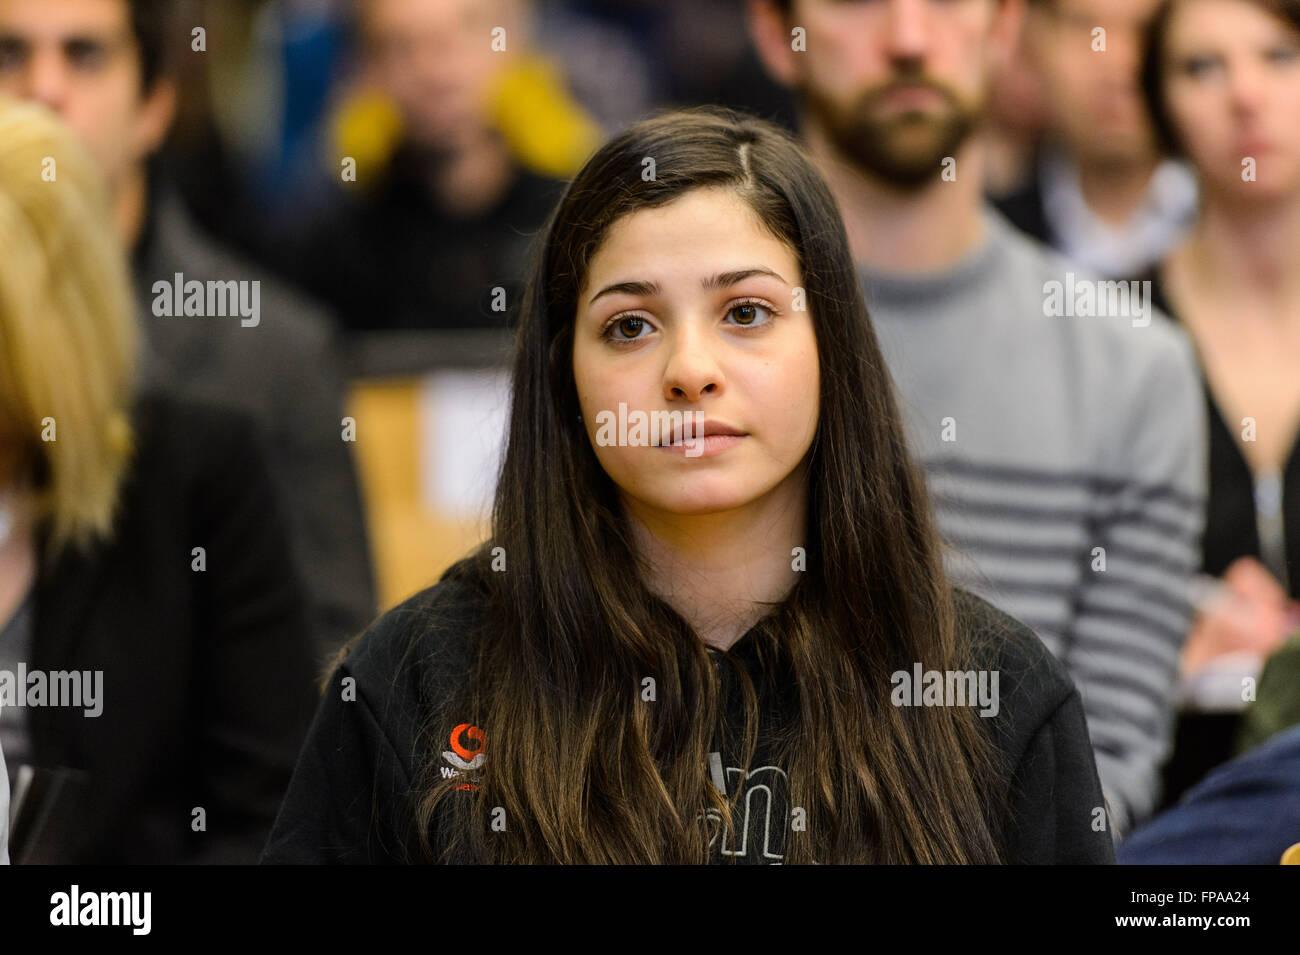 Berlin, Germany. 18th Mar, 2016. The Syrian swimmer Ysra Mardini of Spandau 04 participates in a press conference - Stock Image